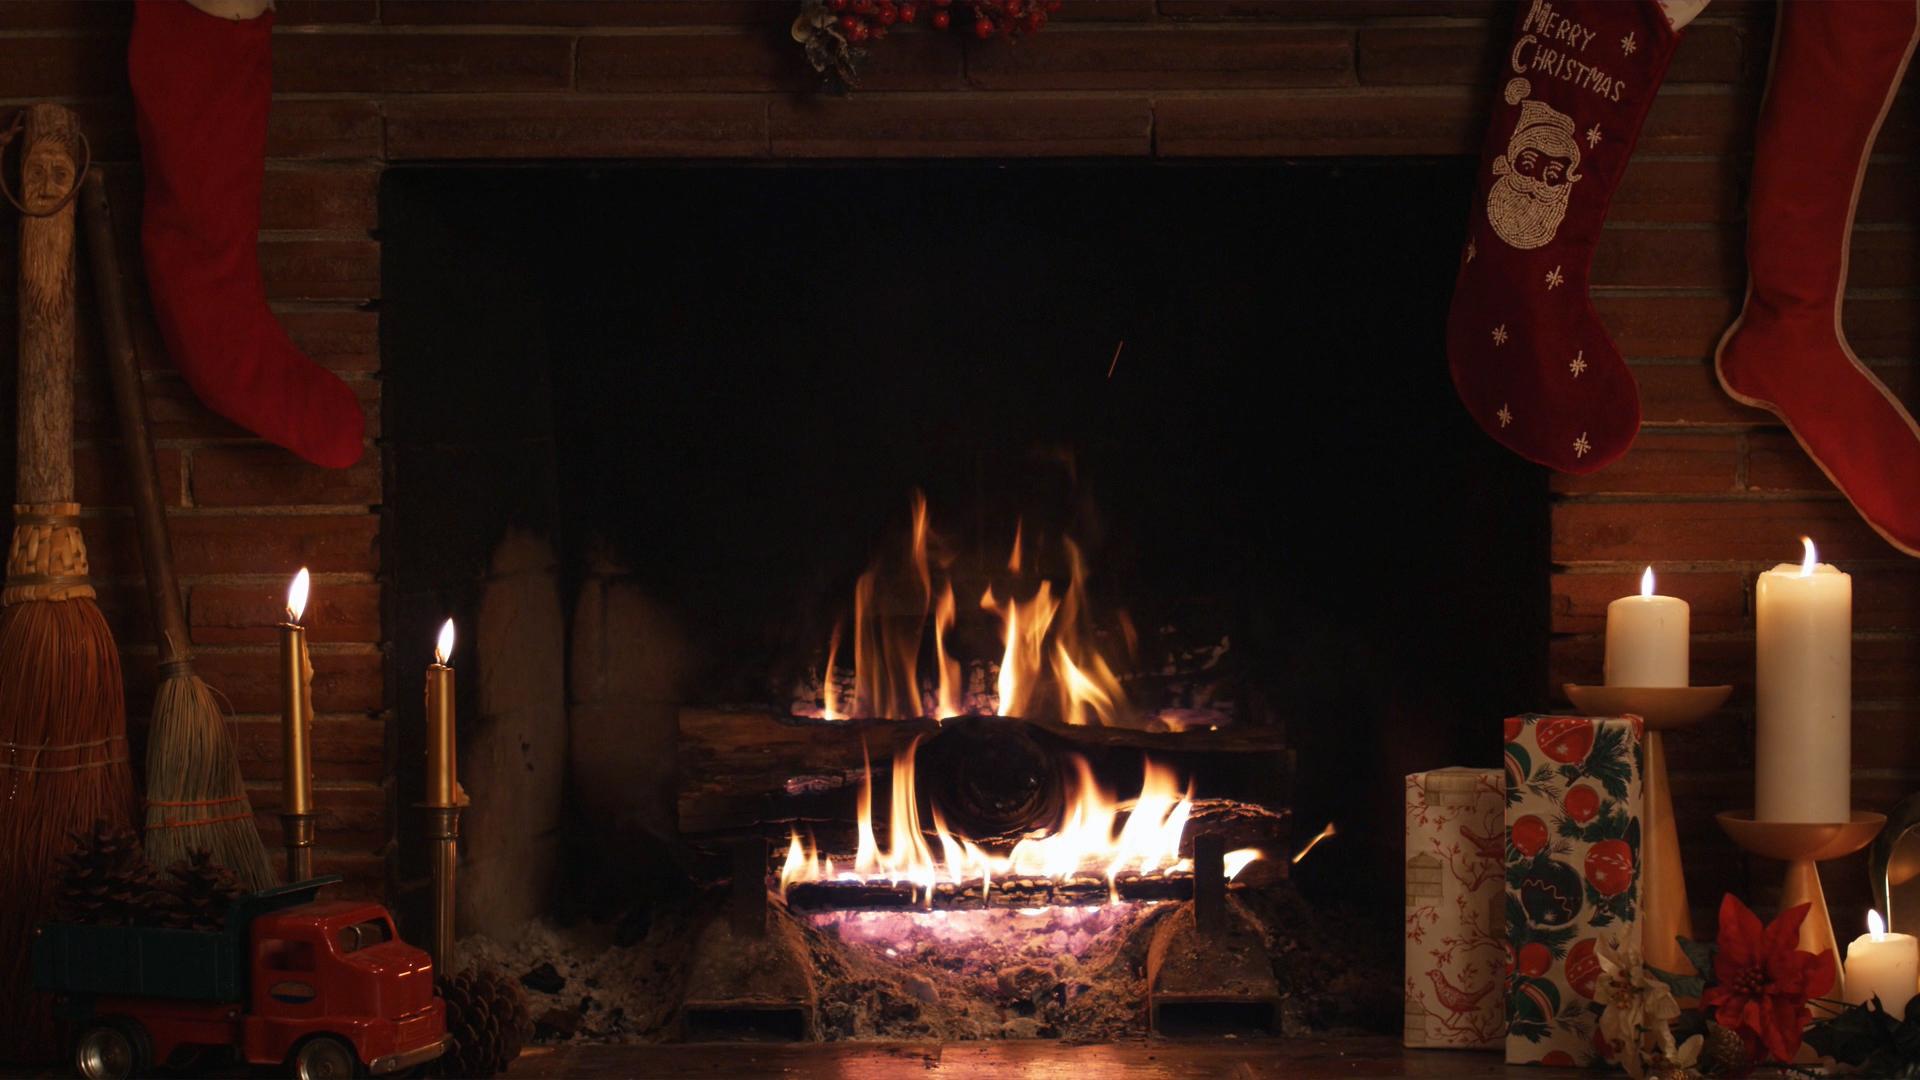 Wincustomize Explore Dream Christmas Fireplace